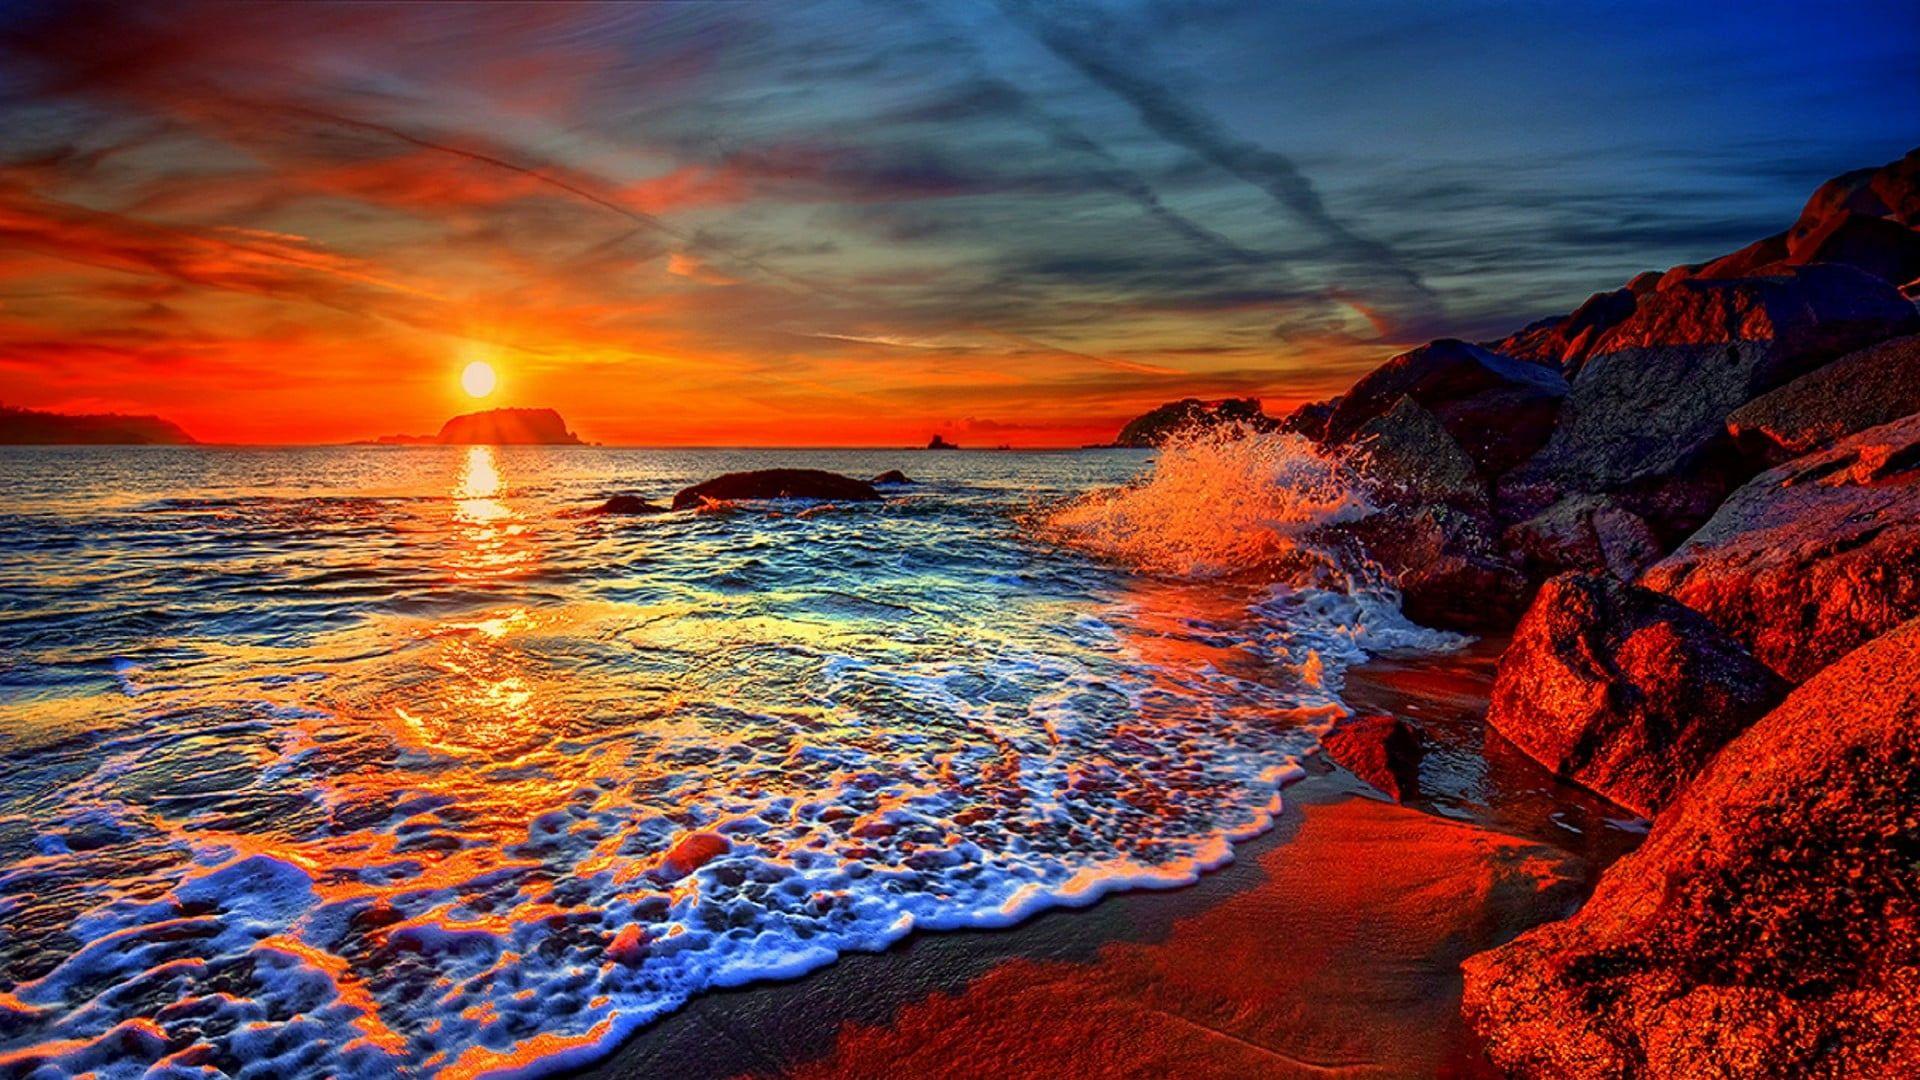 Sky Water Beach Sea Ocean Sand Rock Sunset Sunrise Cloudscape Storm Blue Orange Android Wallpapers Beach Sunset Images Sunset Pictures Sunset Beach Pictures